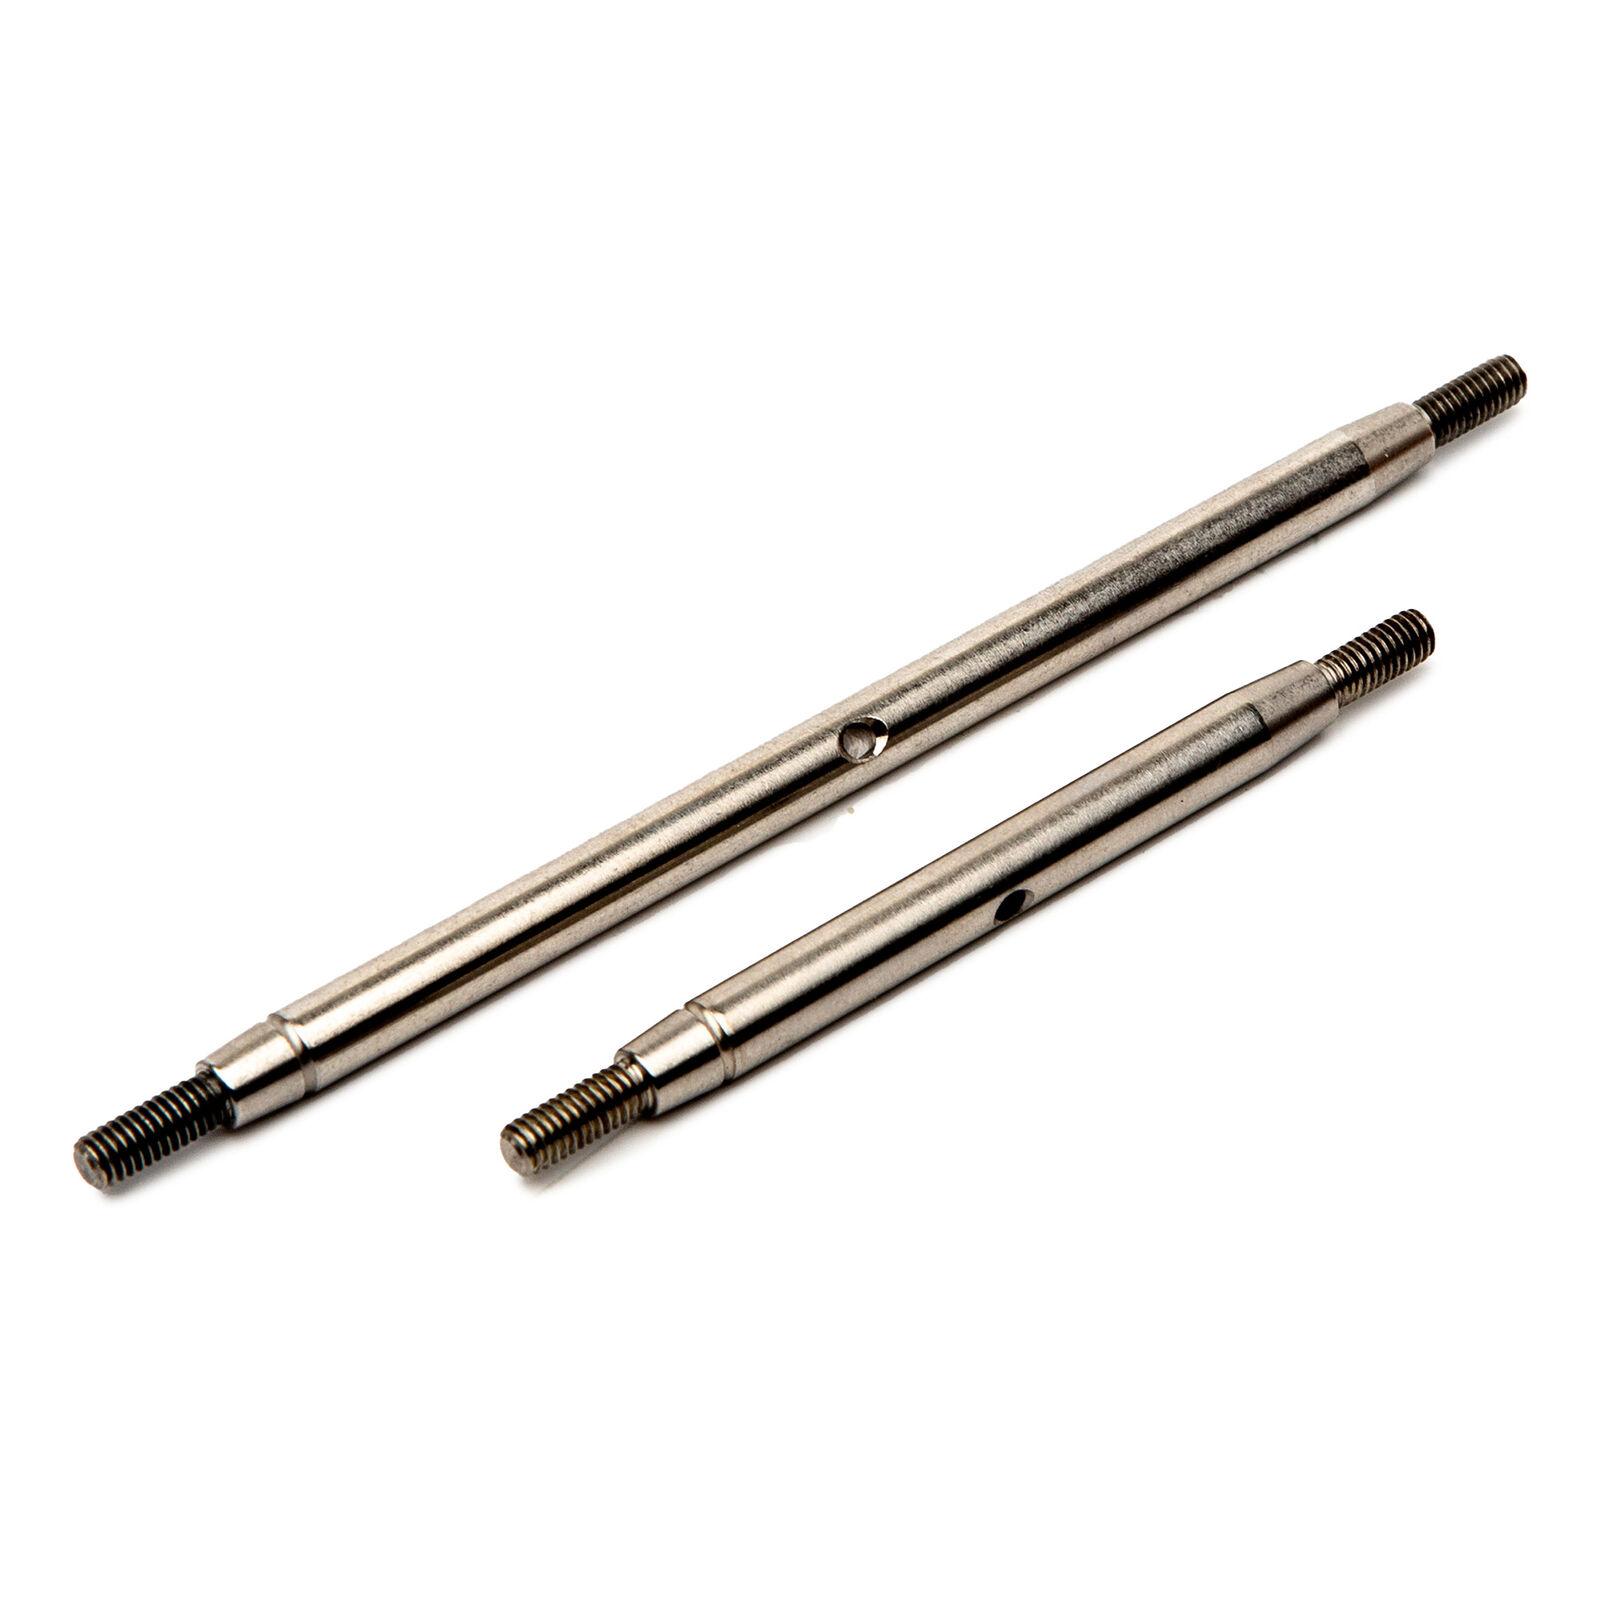 Steering Links Stainless Steel: SCX10 III Std Axle